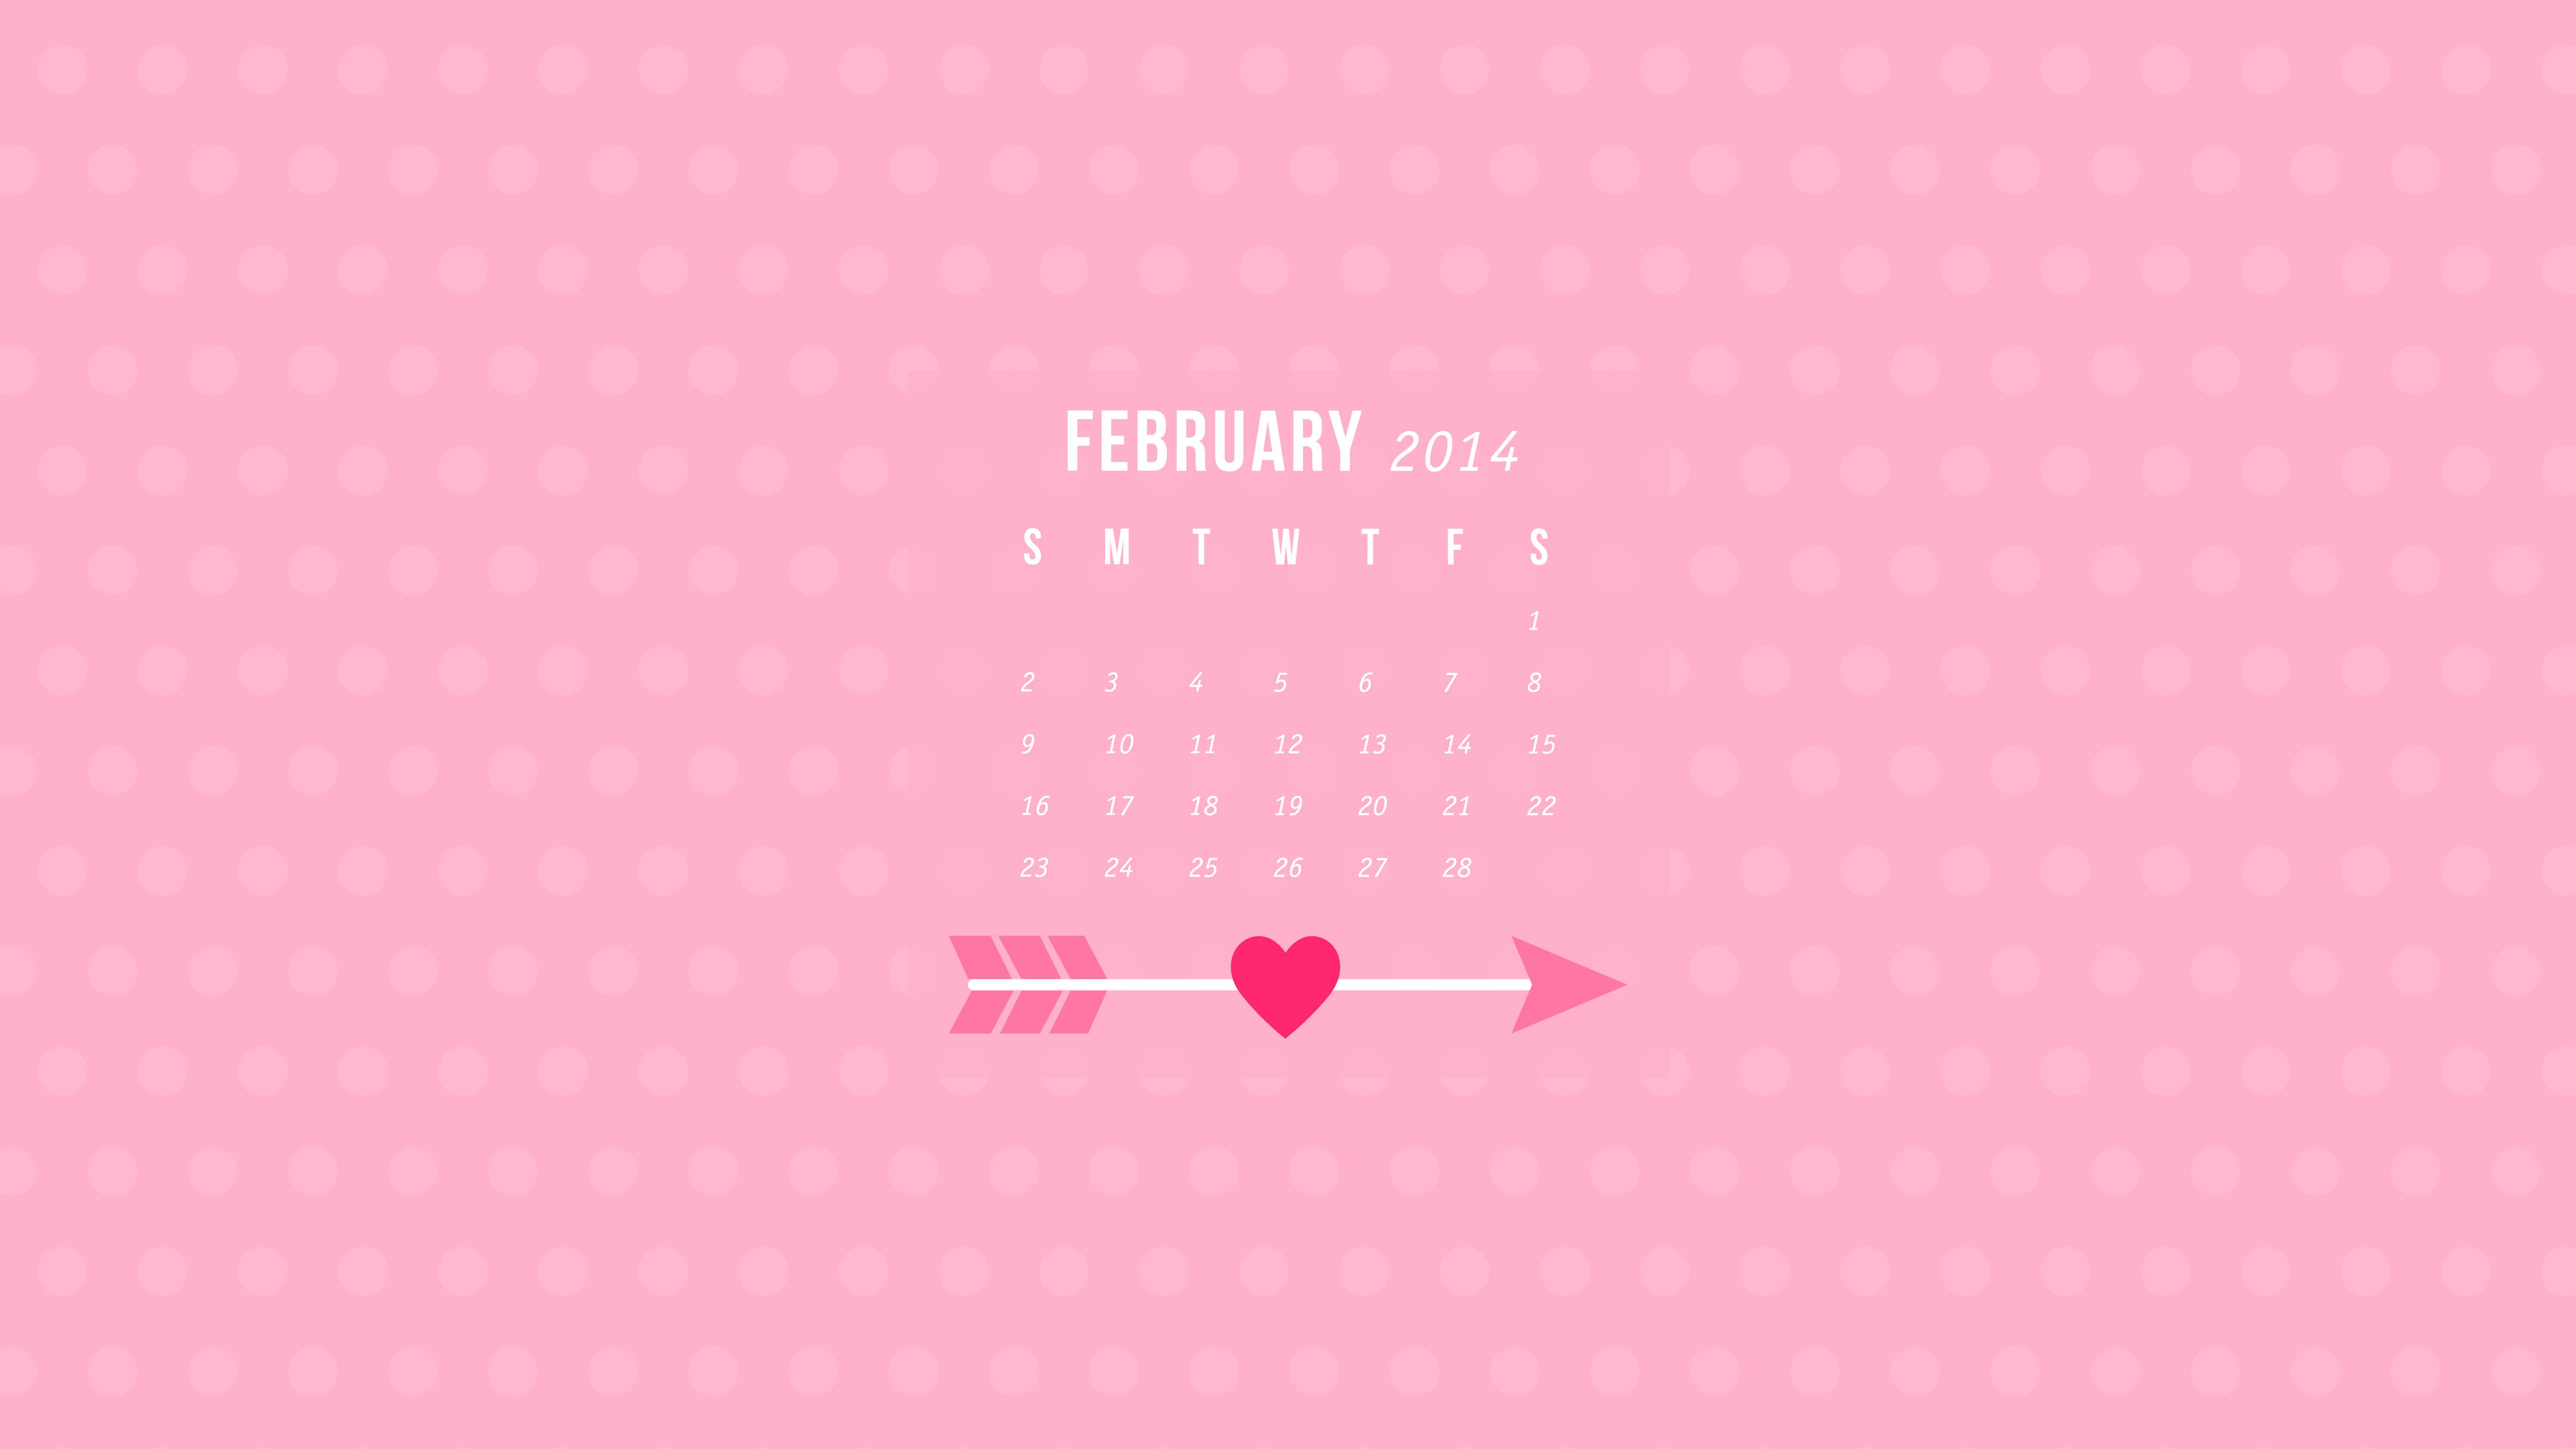 February 2014 Calendar Wallpapers   Sarah Hearts 5333x3000